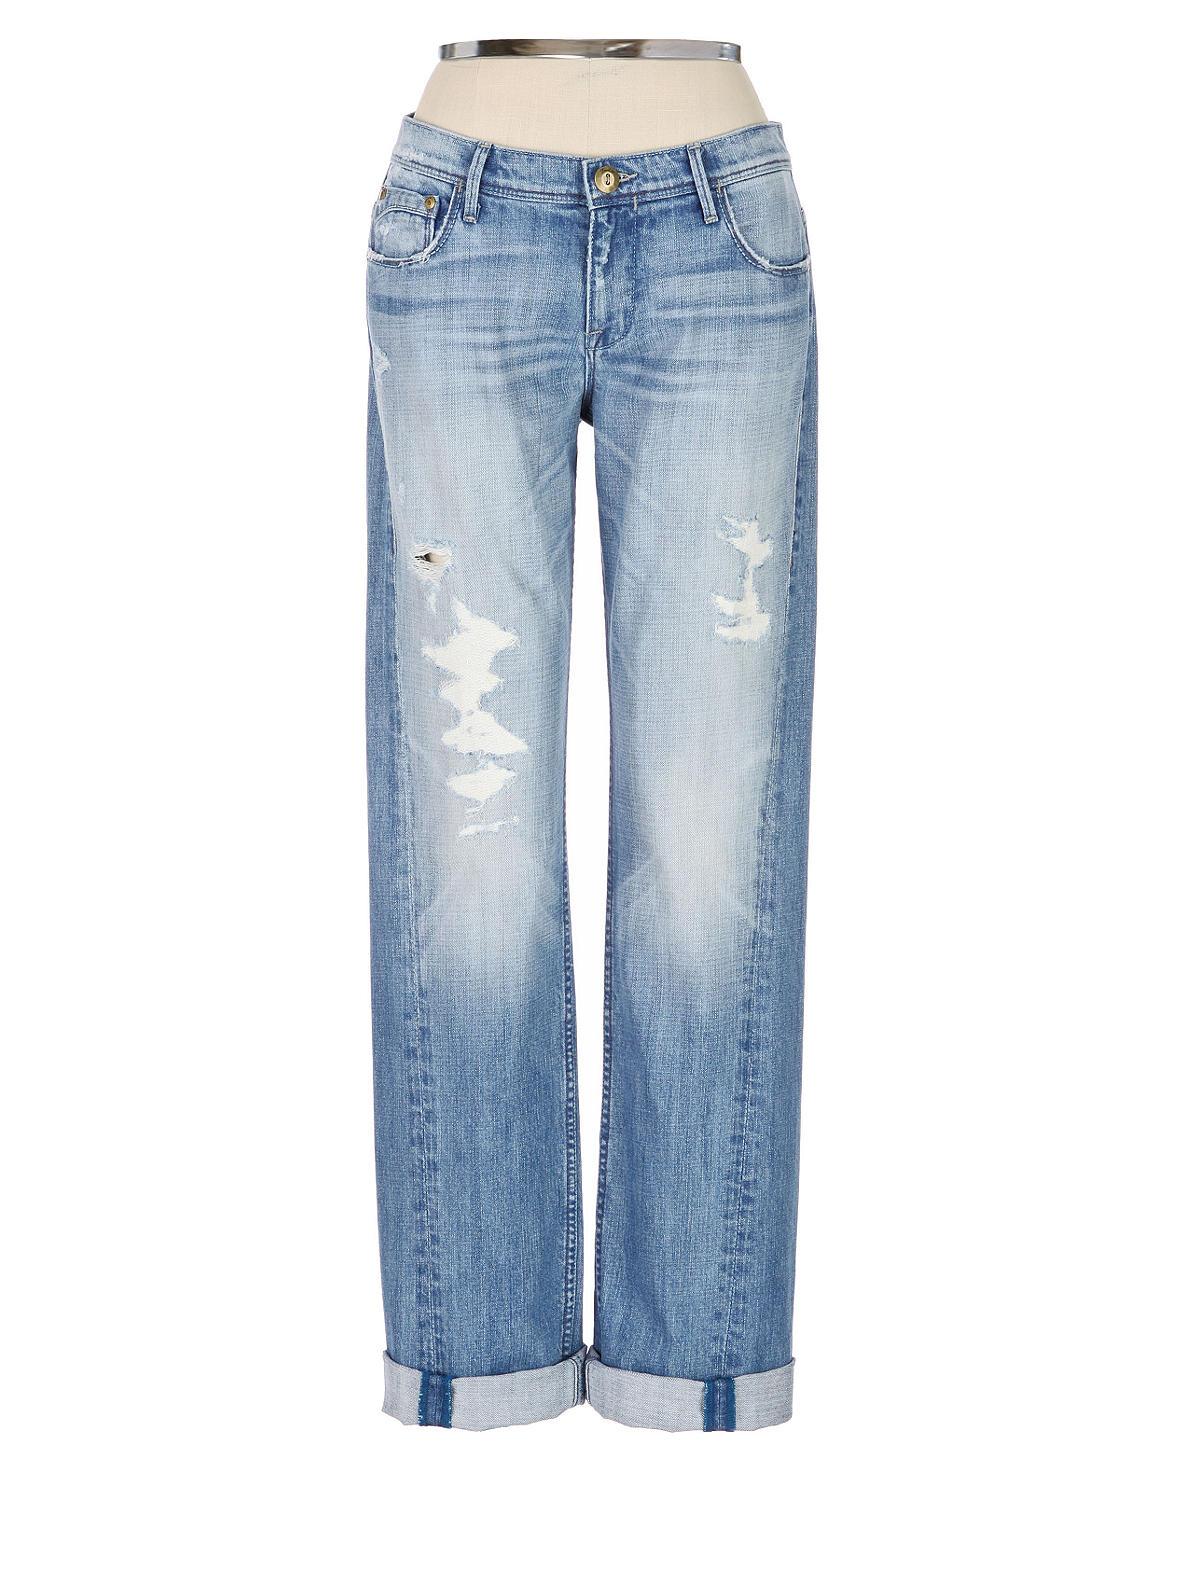 Level 99 Joplin Distressed Denim -Anthropologie.com :  jeans jean level 99 denim